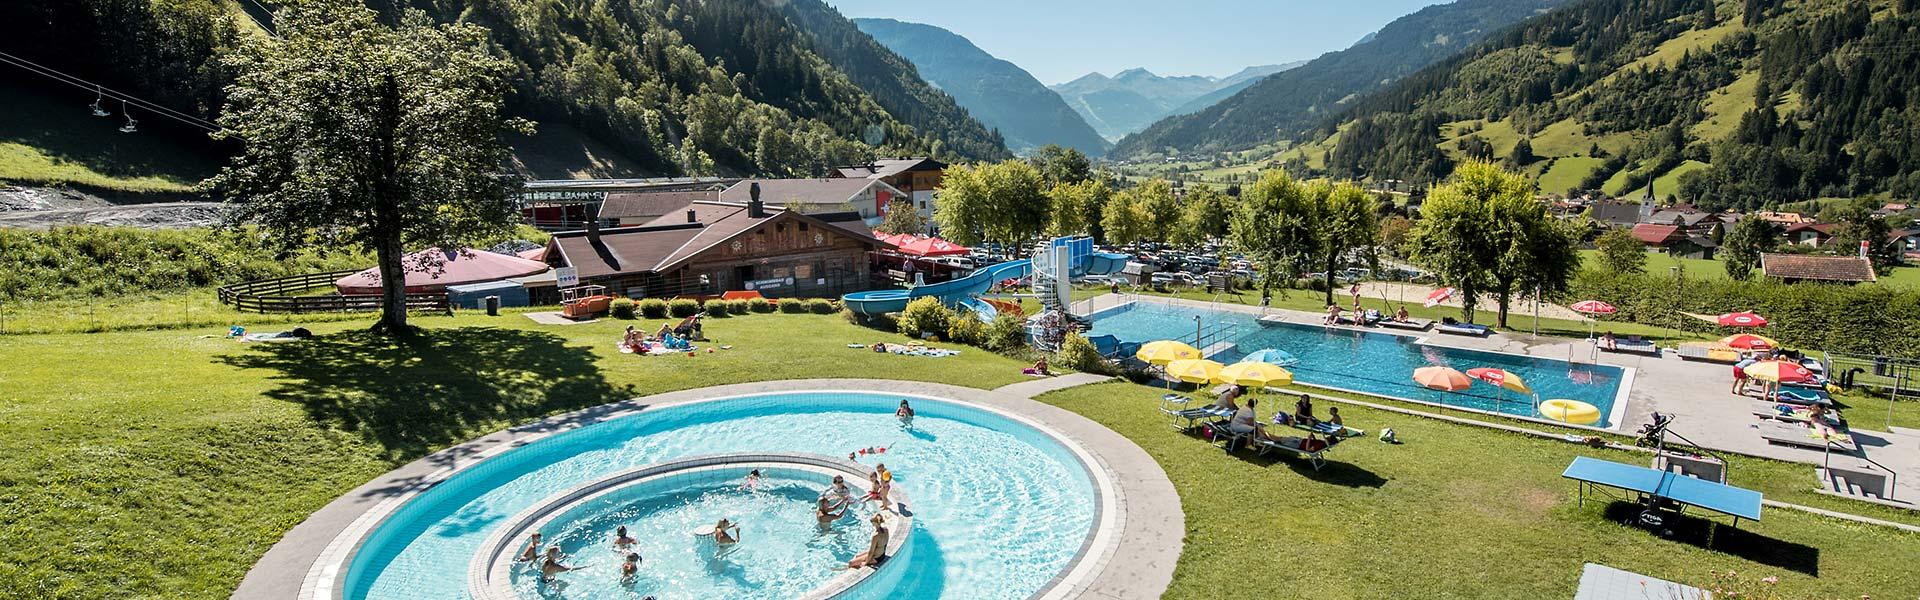 Solarbad in Dorfgastein